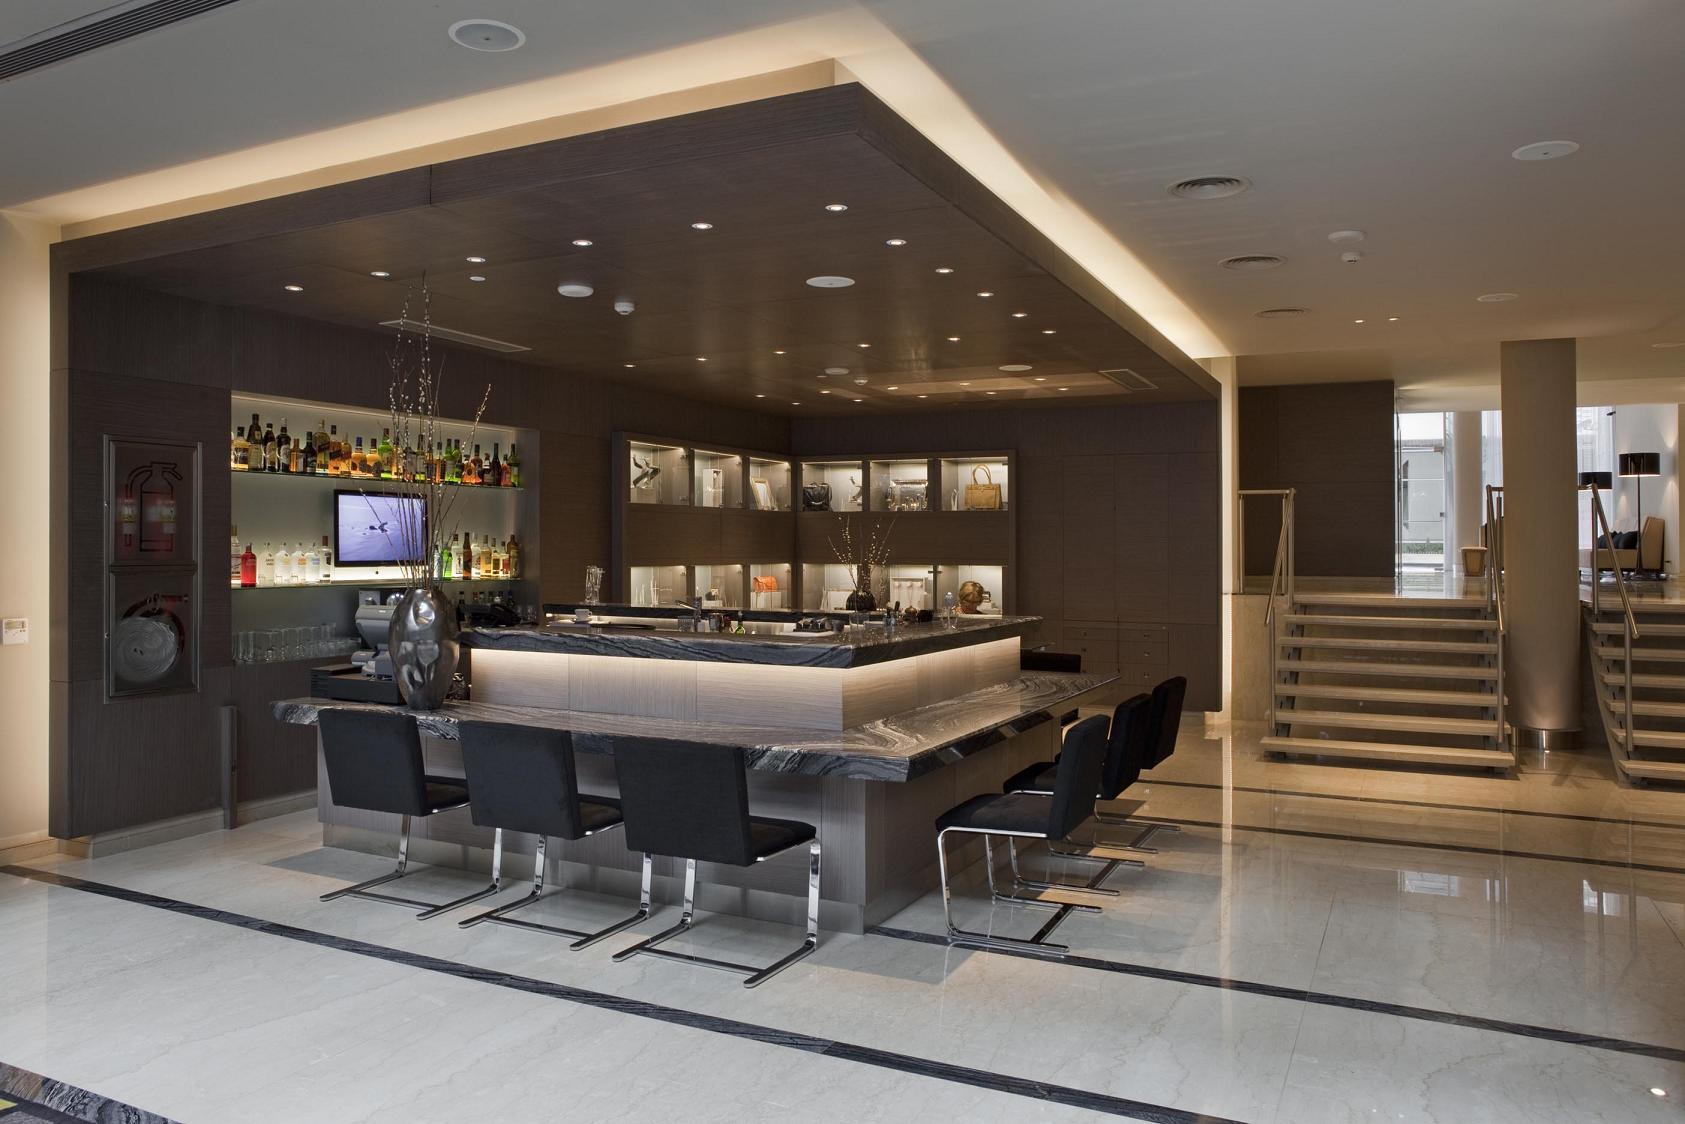 Arquitectura interior en hoteles spodek arquitectos for Arquitectura de hoteles